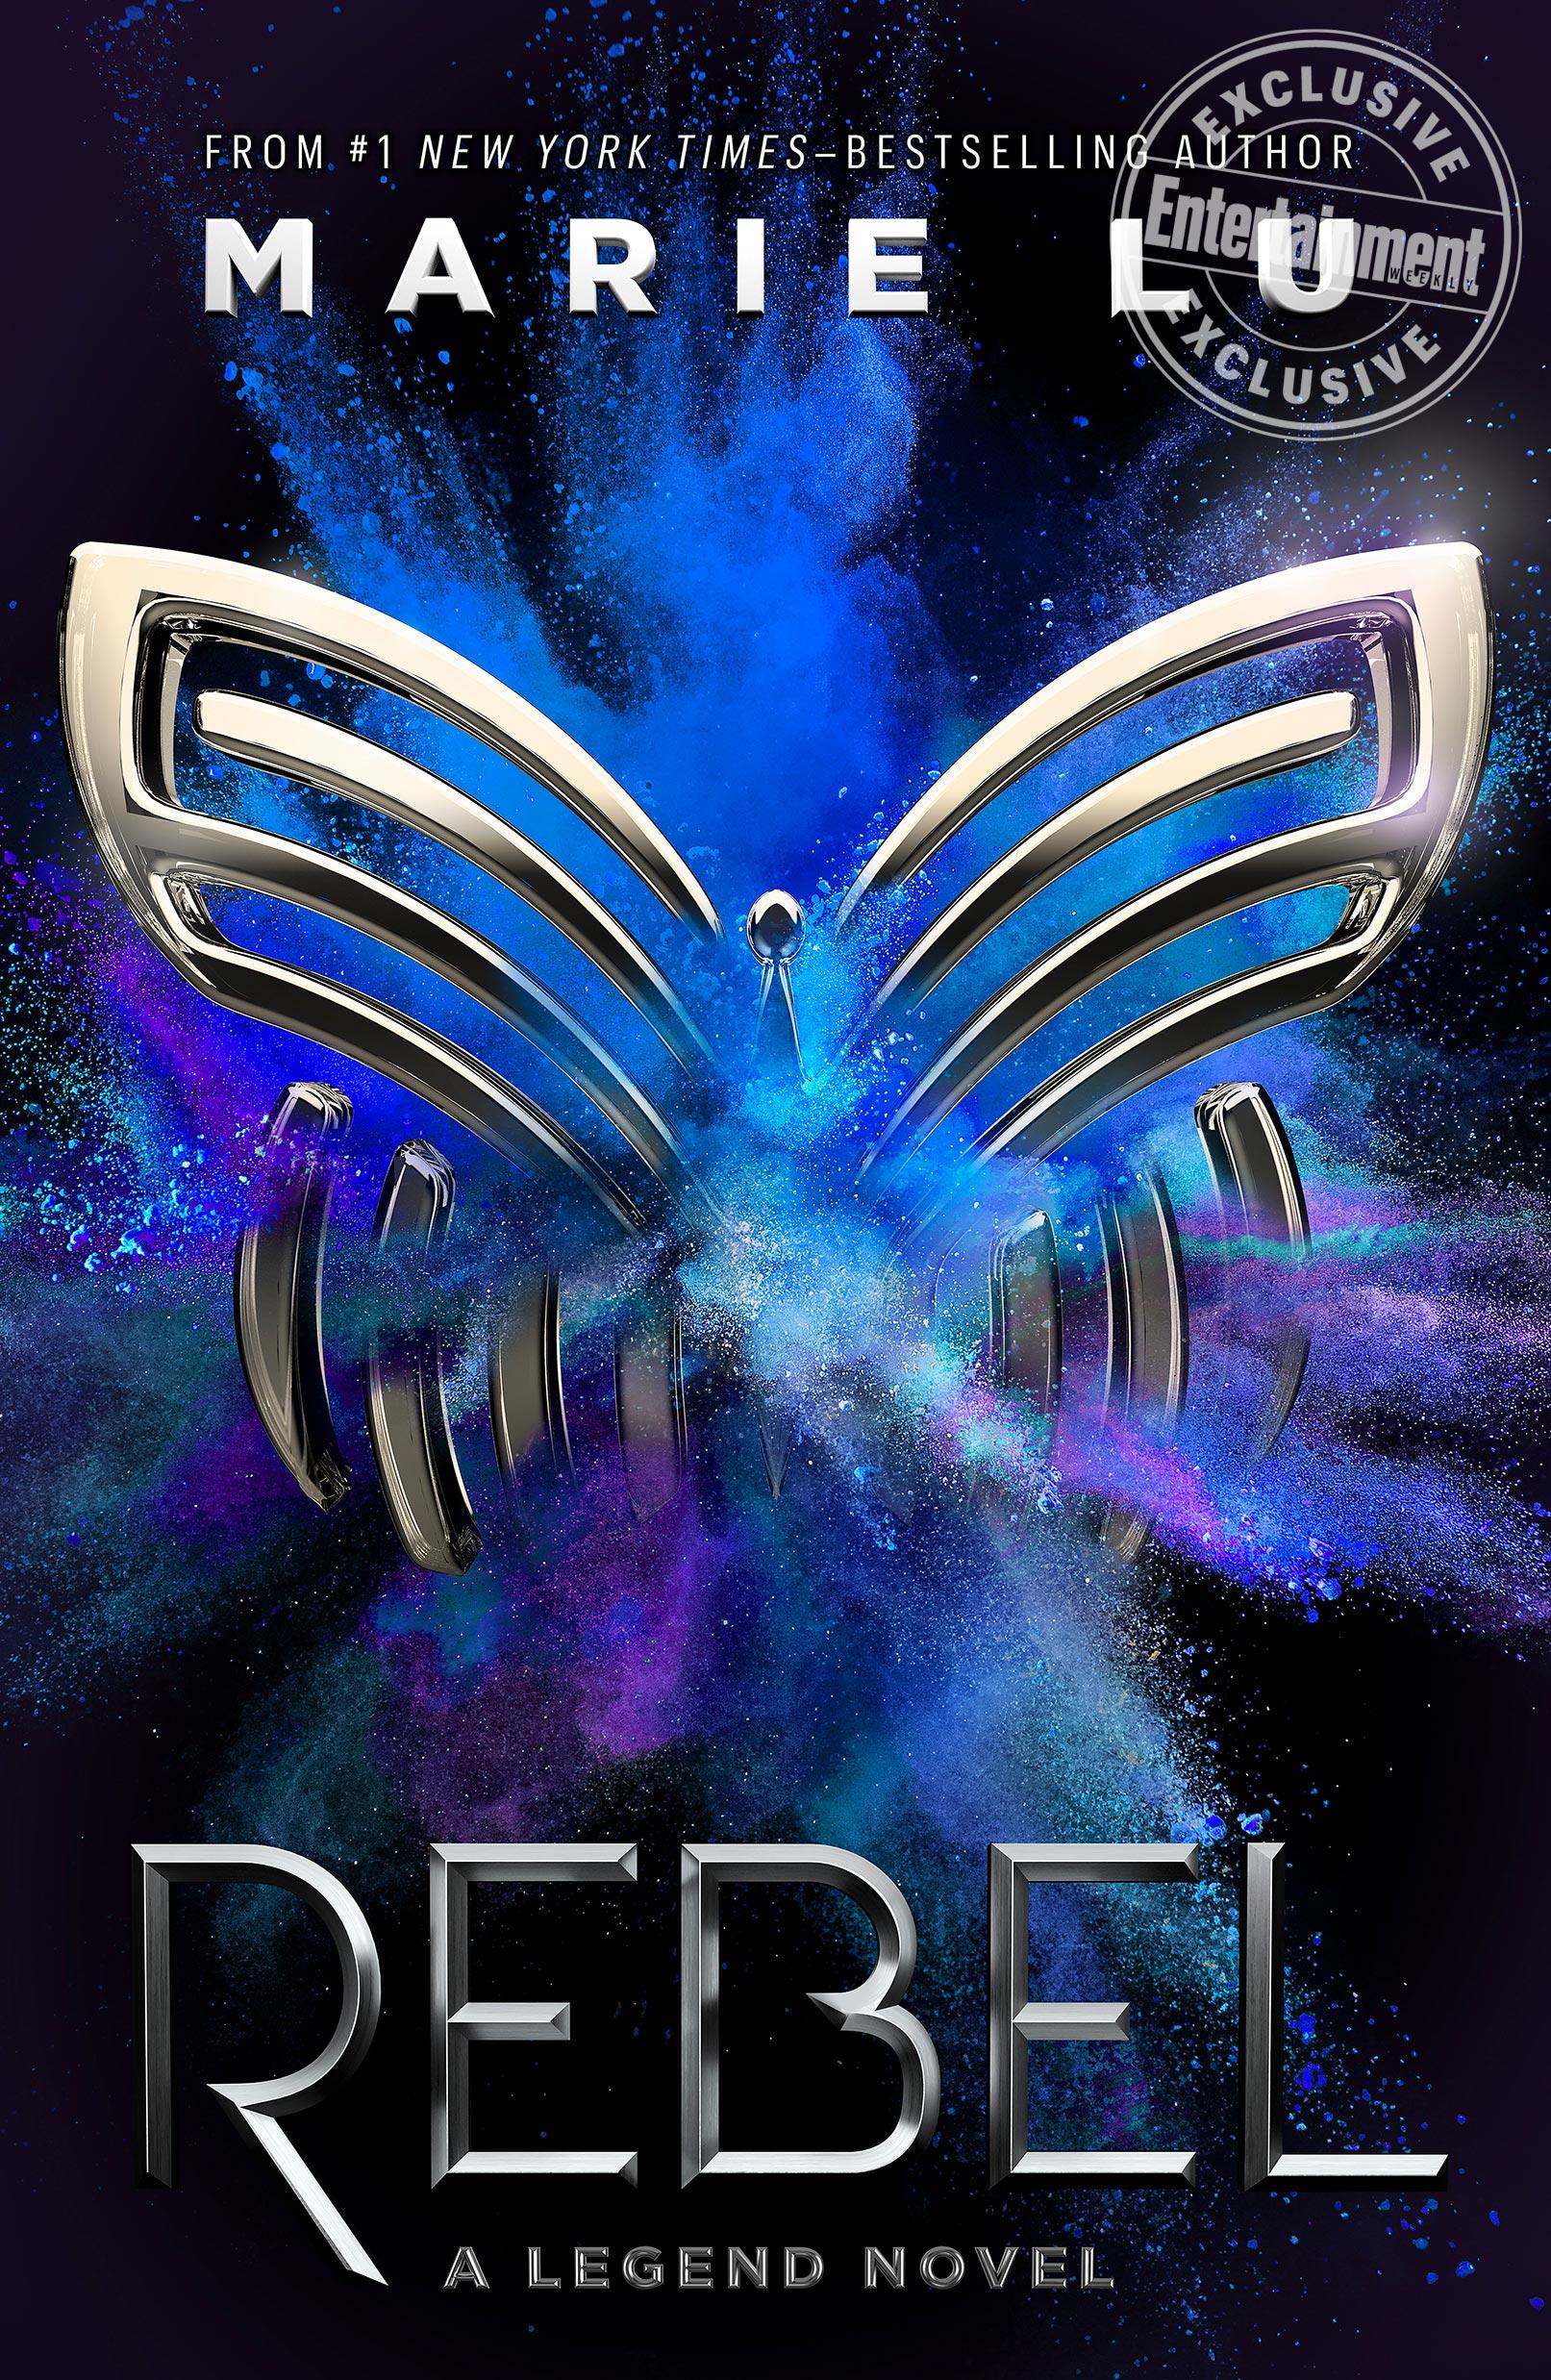 'Rebel' by Marie Lu book cover